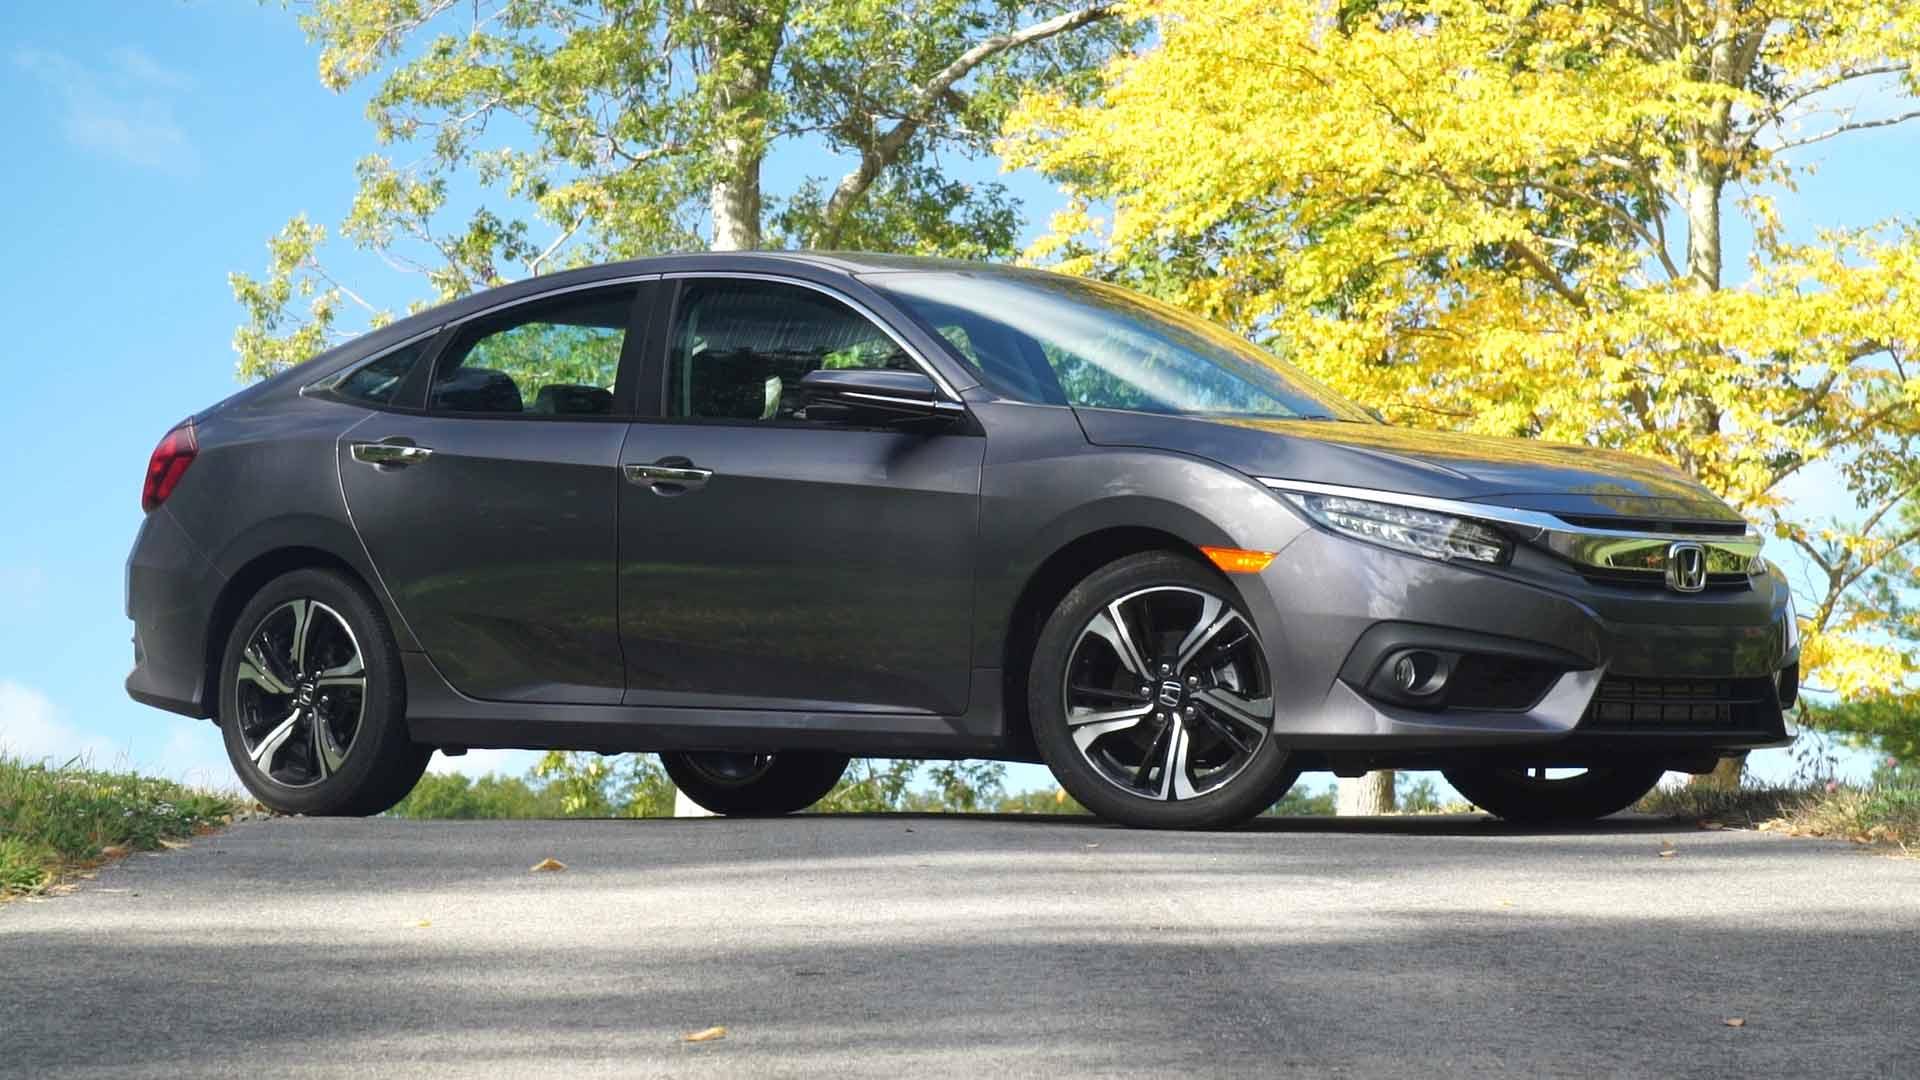 1078702682_4824698685001_1510QD-Honda-Civic-StillB